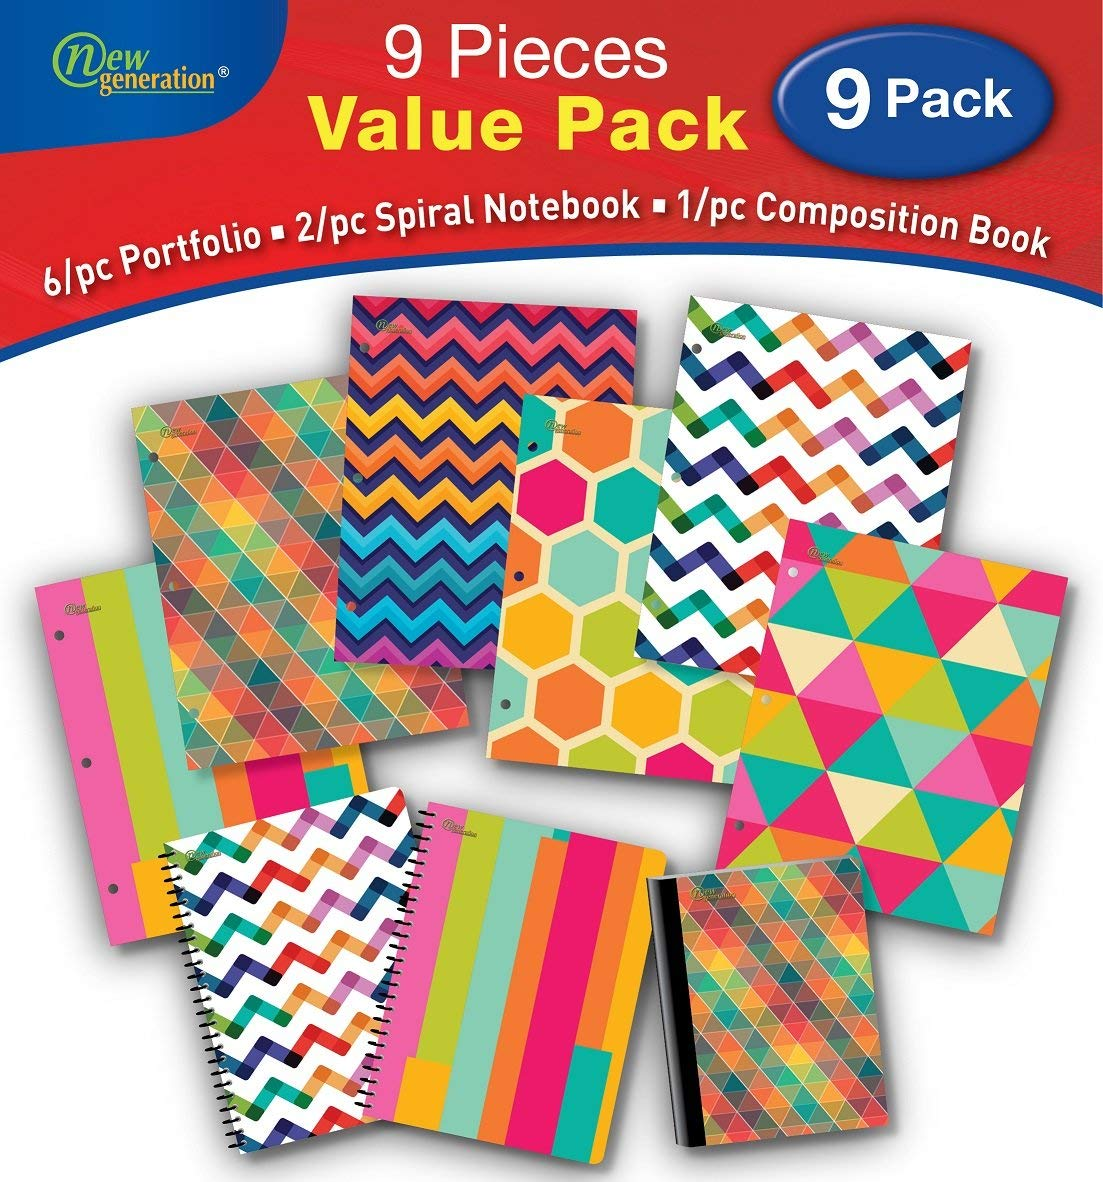 New Generation - Pattern - 9/PC Bundle Value Pack contain, 6/pc Folders, 2/pc Spiral Notebooks,1/pc Composition Book - 9/pcs Bundle set, (WIDE Ruled 9 PIECE VALUE PACK)